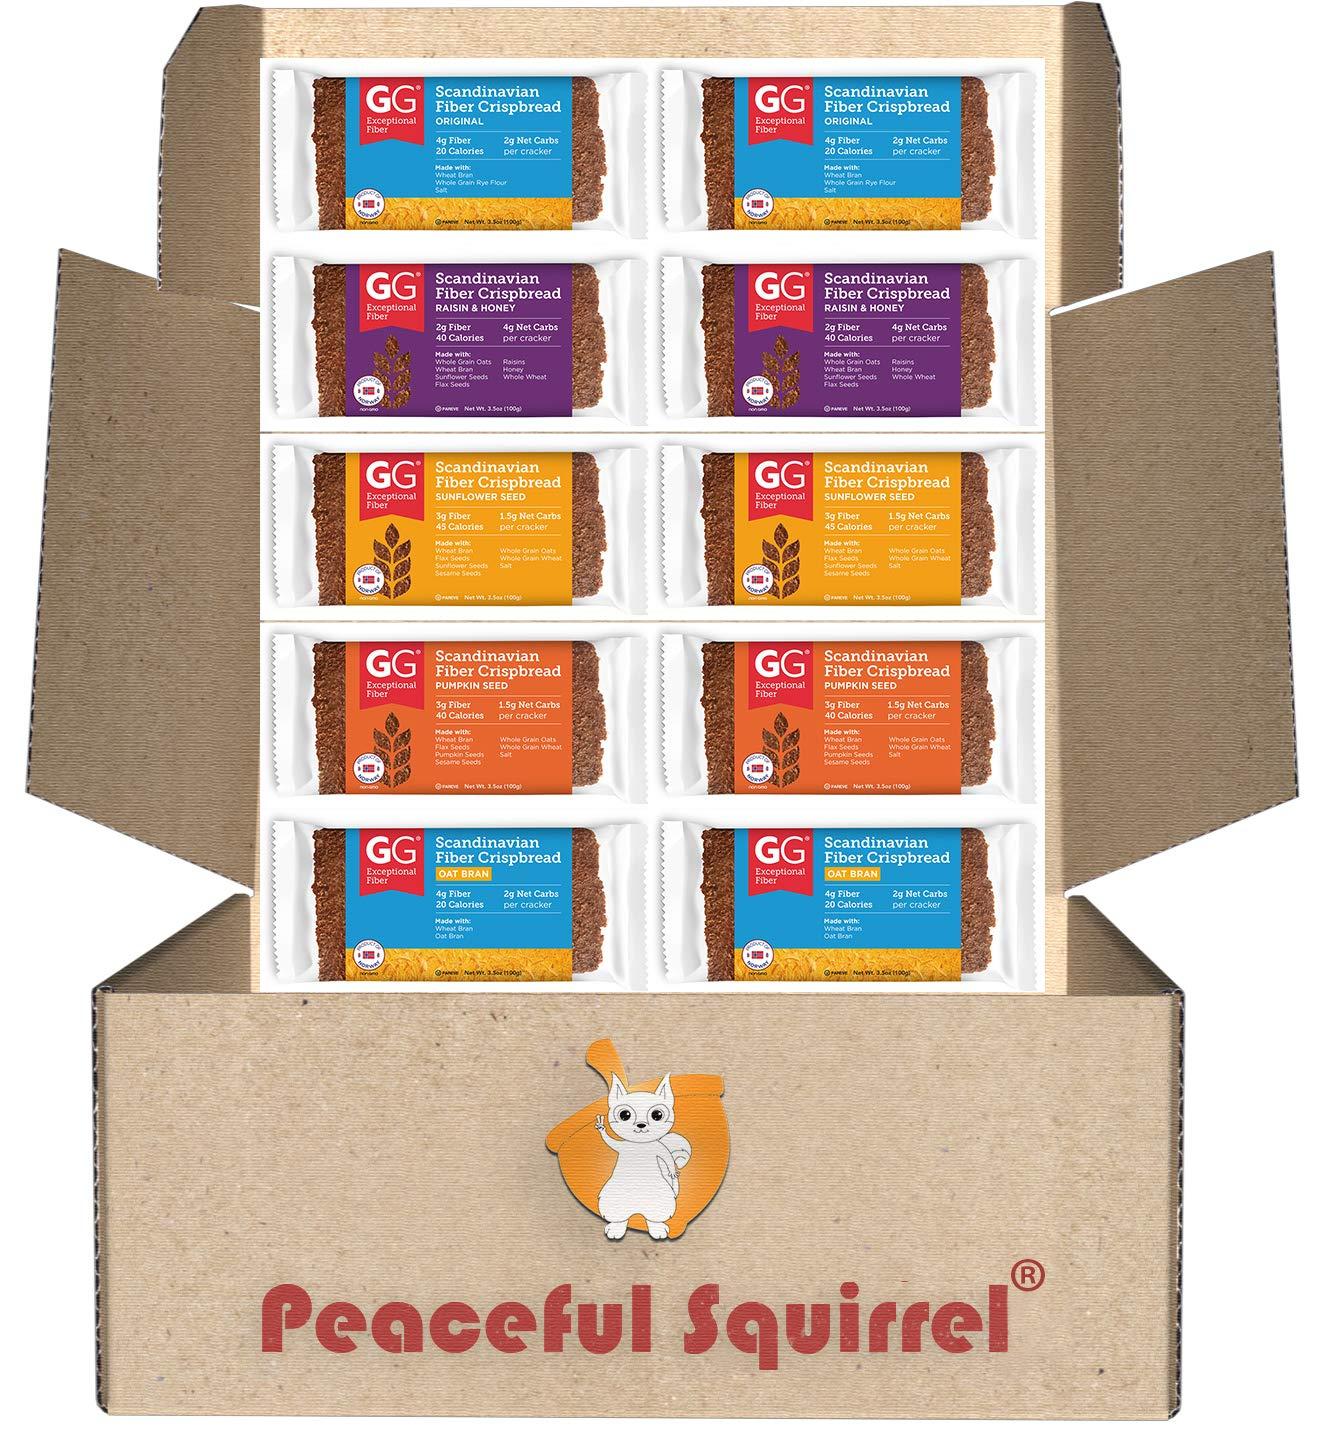 Peaceful Squirrel Variety, GG Scandinavian Crispbread Thins, Pack of 10 (2 of Each: Original, Original with Oat Bran, Sunflower Seeds, Pumpkin Seeds, Raisin & Honey) by Peaceful Squirrel (Image #2)